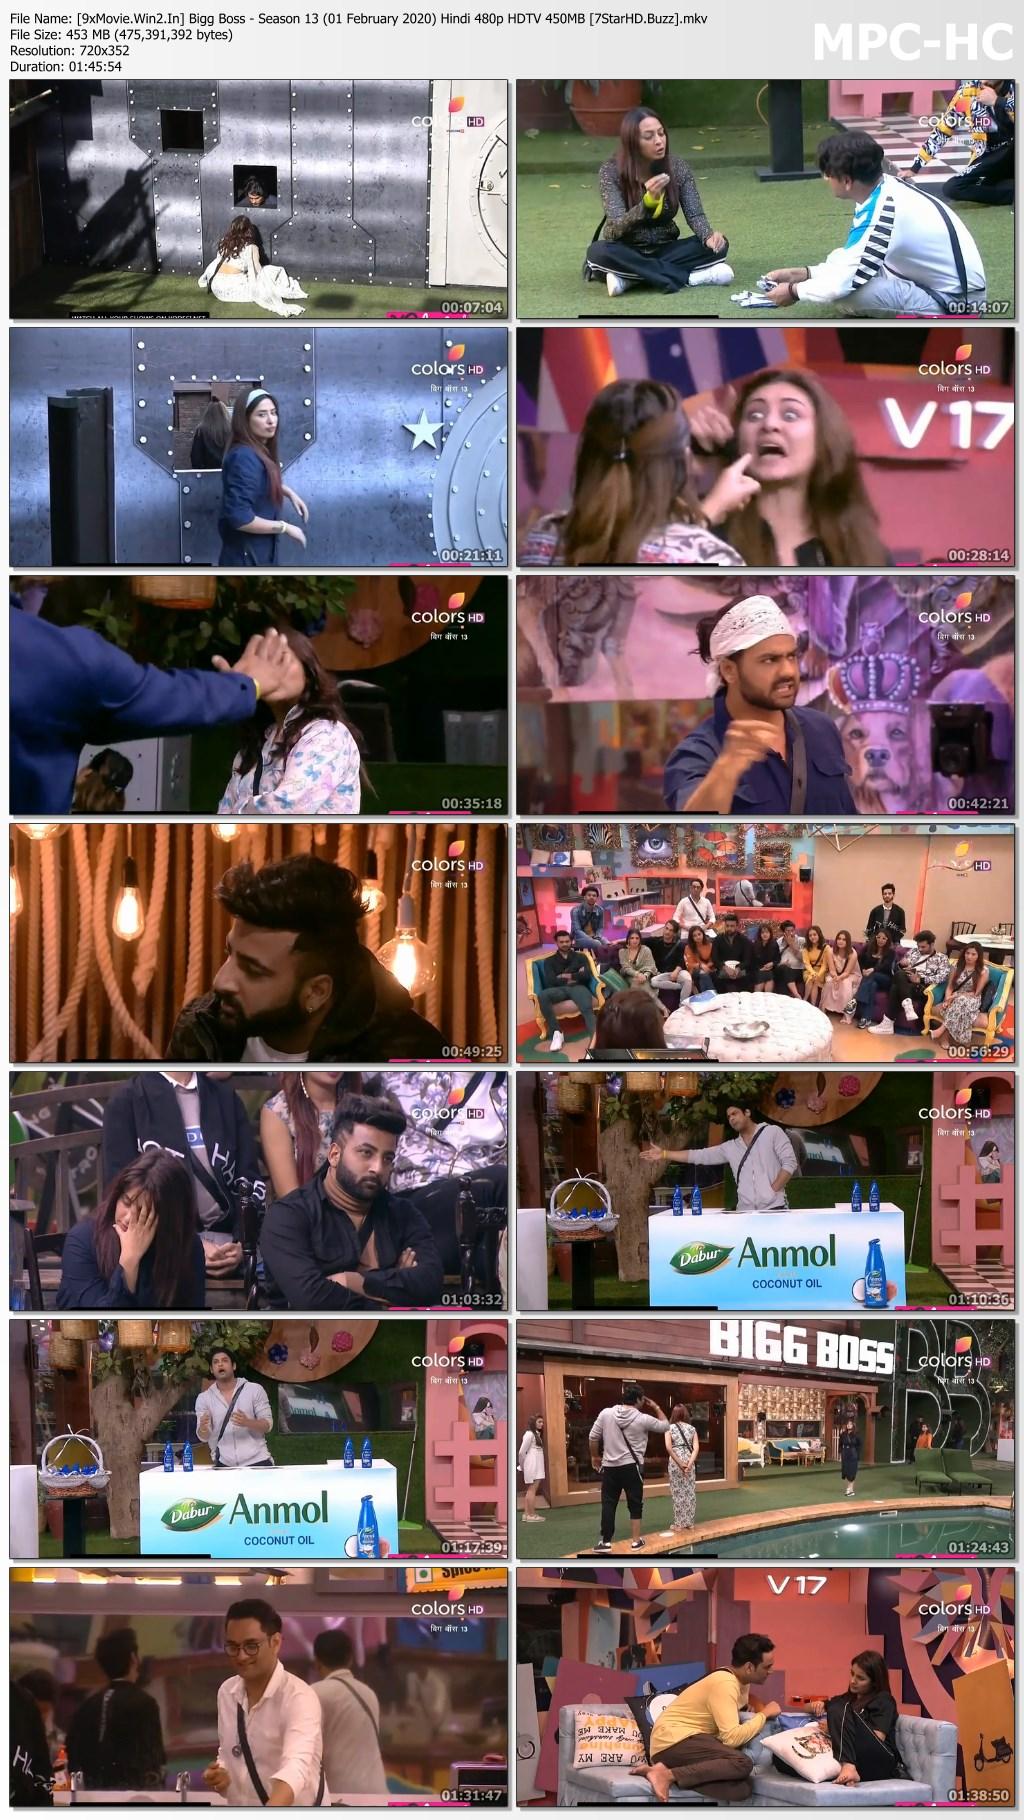 Bigg Boss - Season 13 (01 February 2020) Hindi 480p HDTV x264 450MB